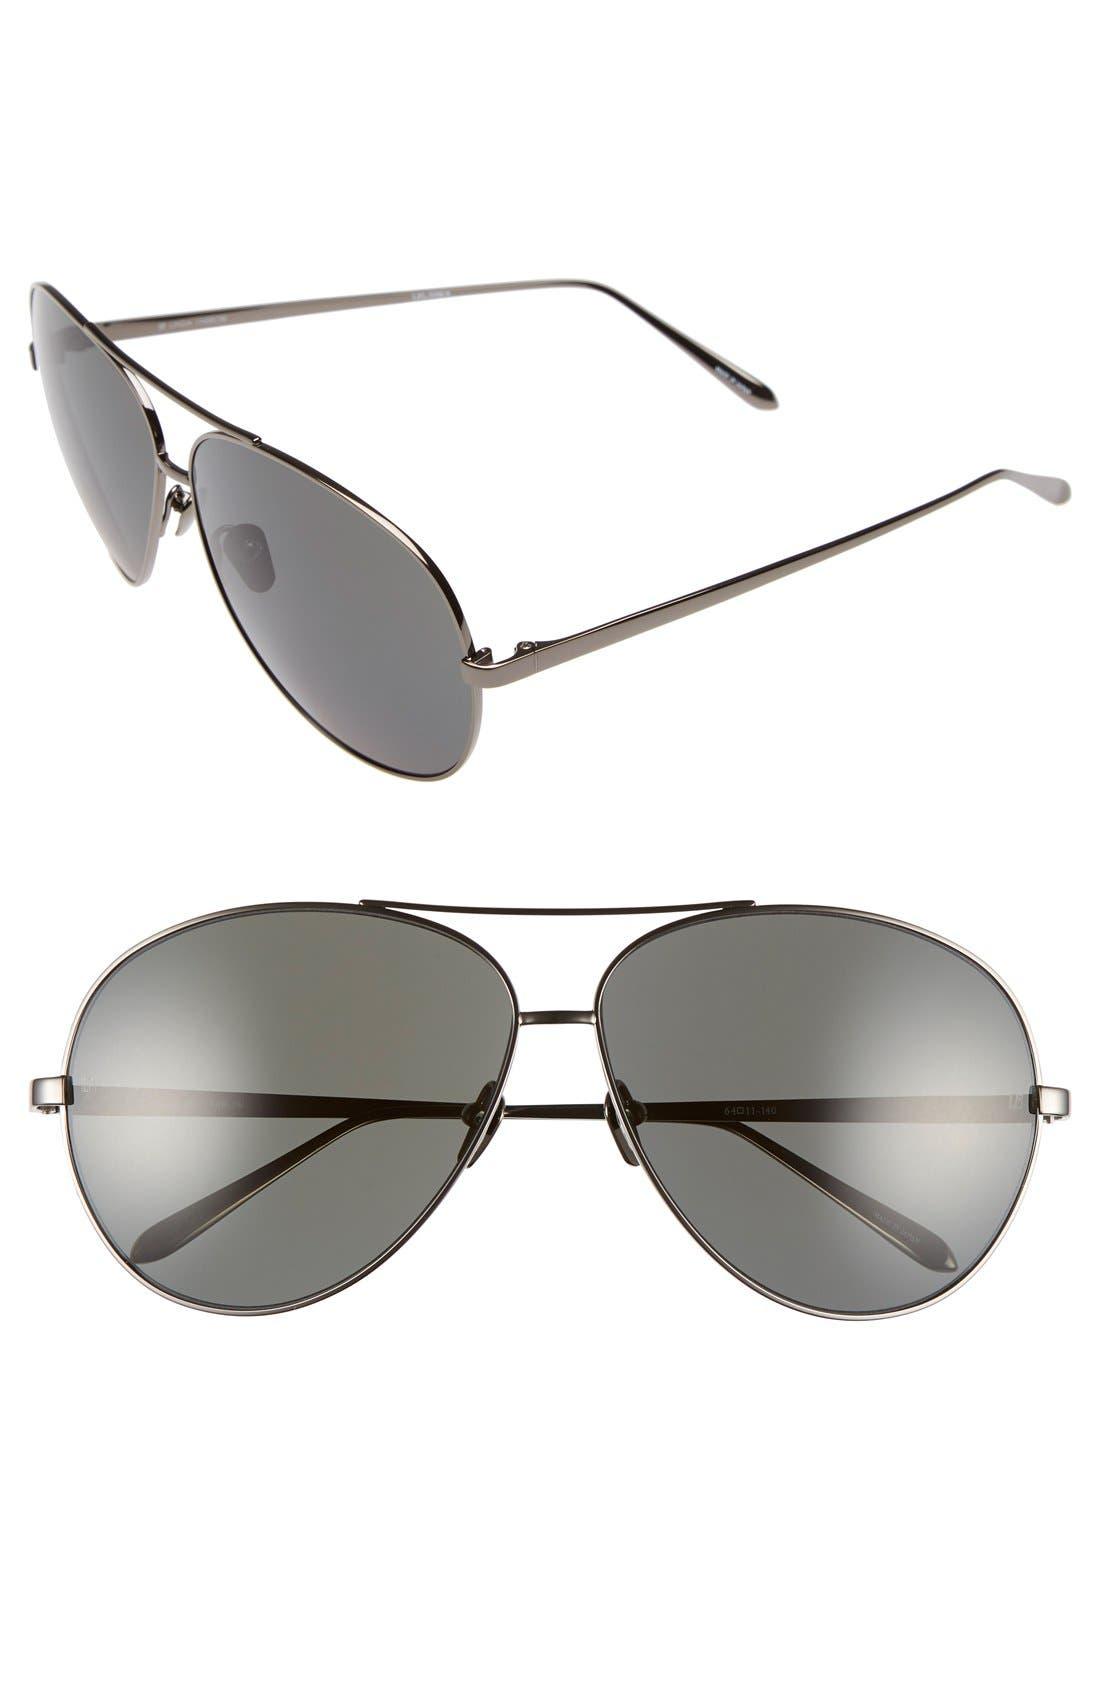 Alternate Image 1 Selected - Linda Farrow 64mm Aviator Sunglasses